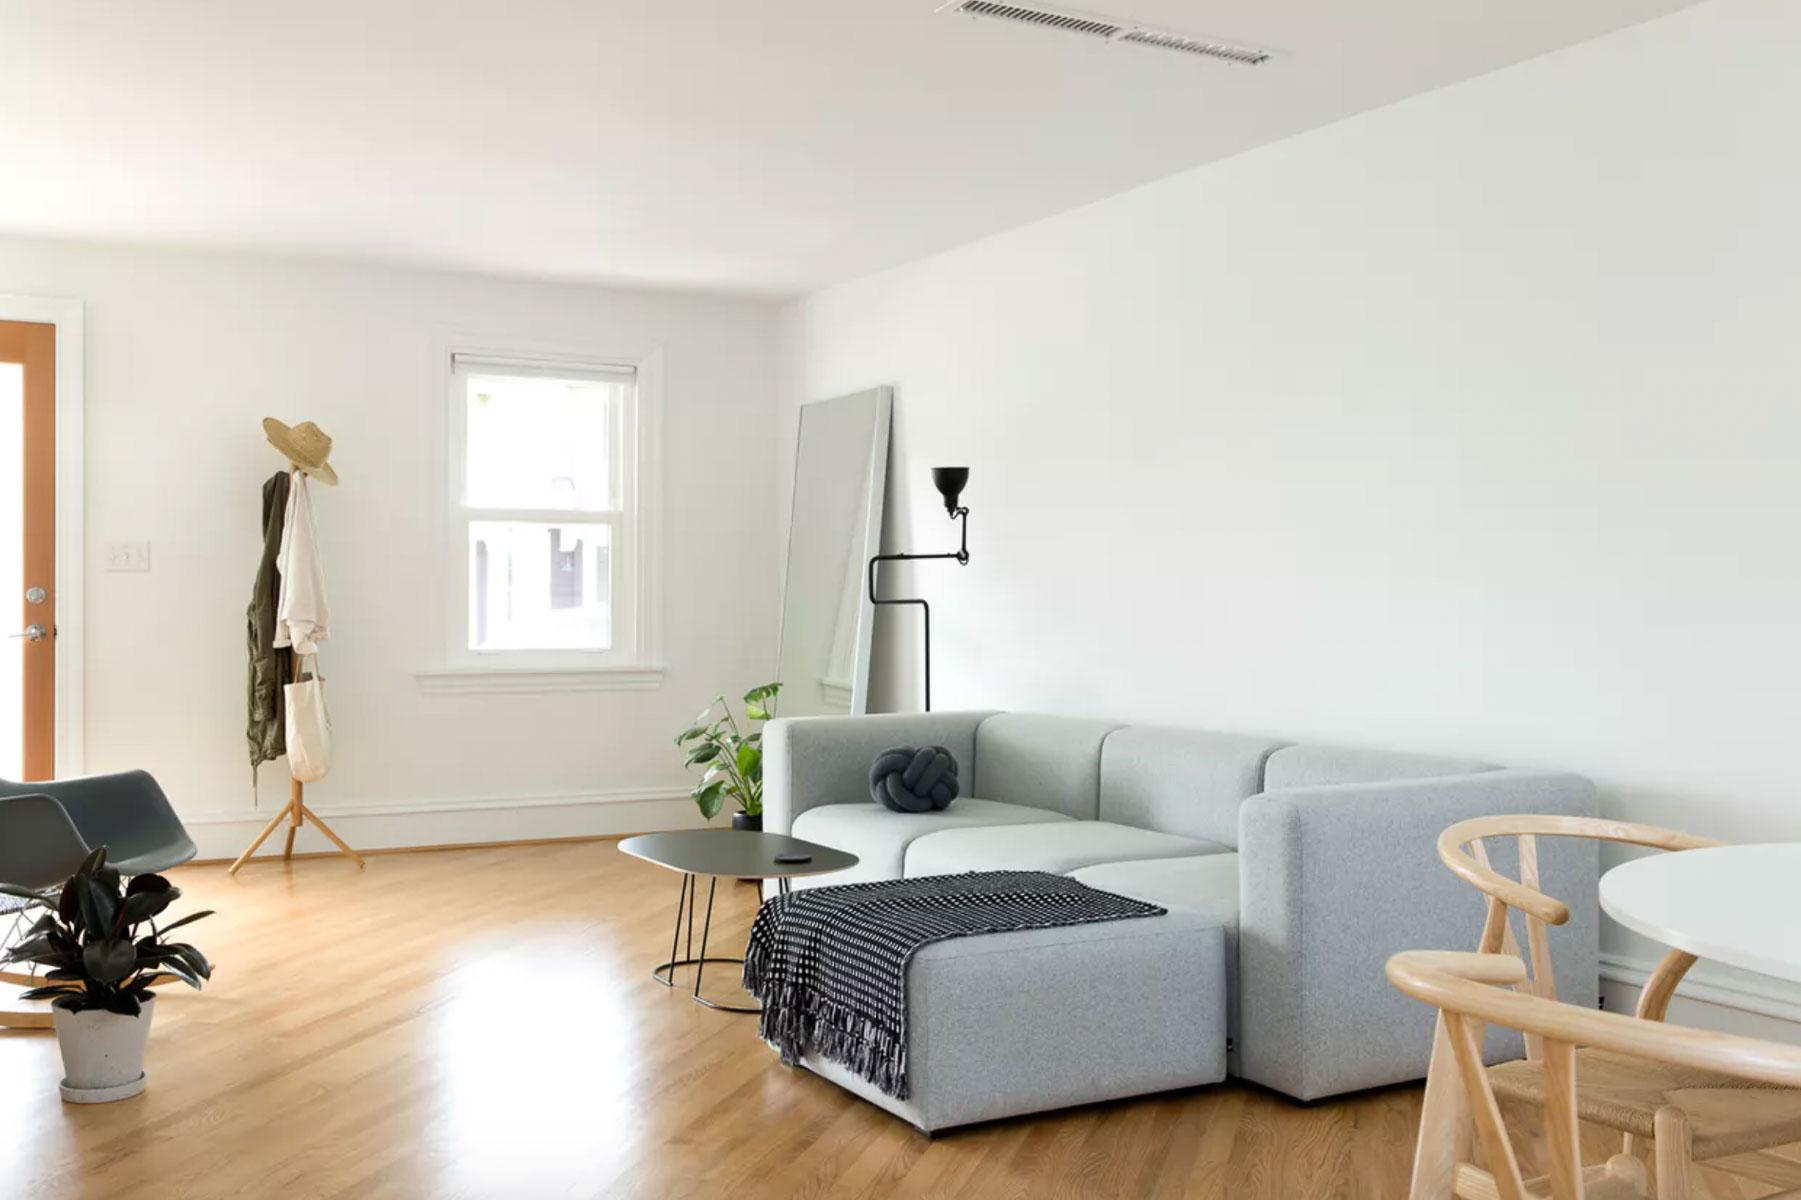 minimal-rowhouse_richmond-virginia-natural-light-photoshoot-location-10.jpg